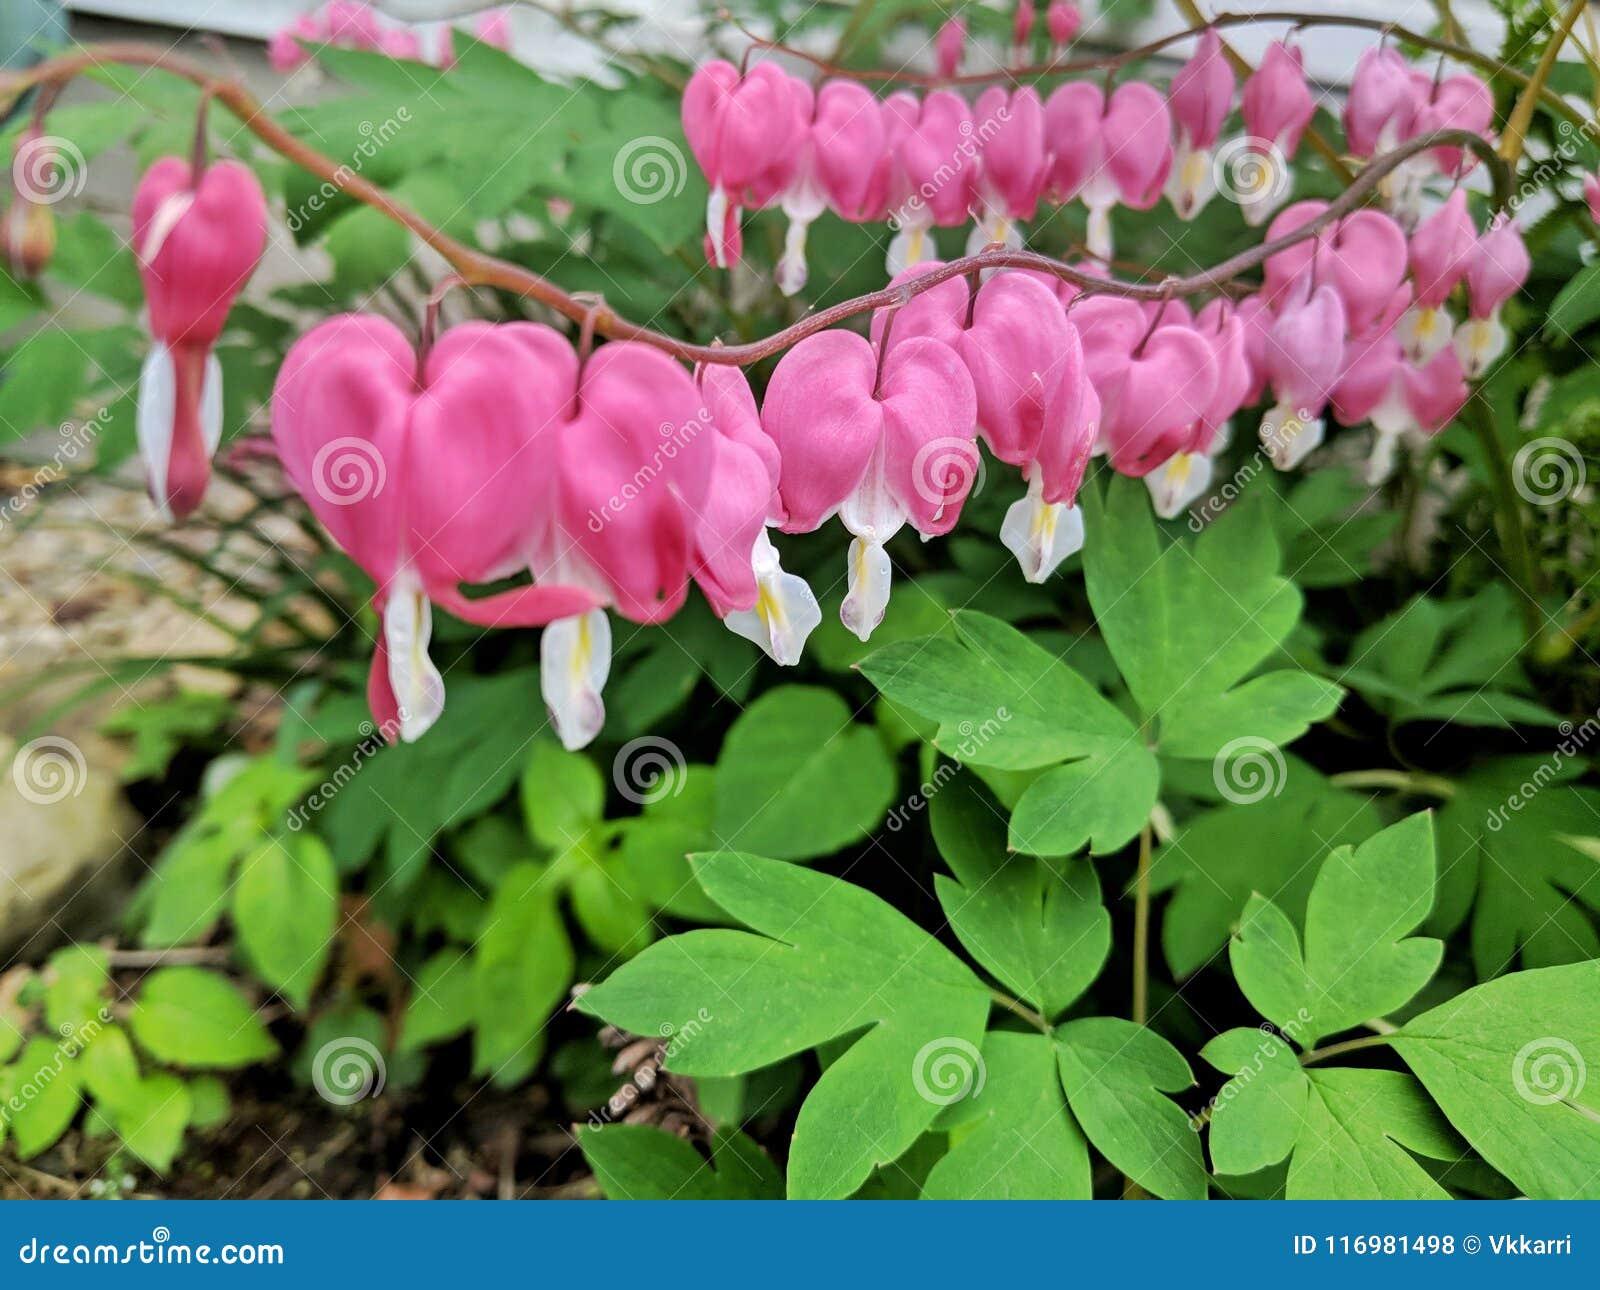 Bleeding Hearts Chain In Bloom Stock Photo Image Of Loving Petal